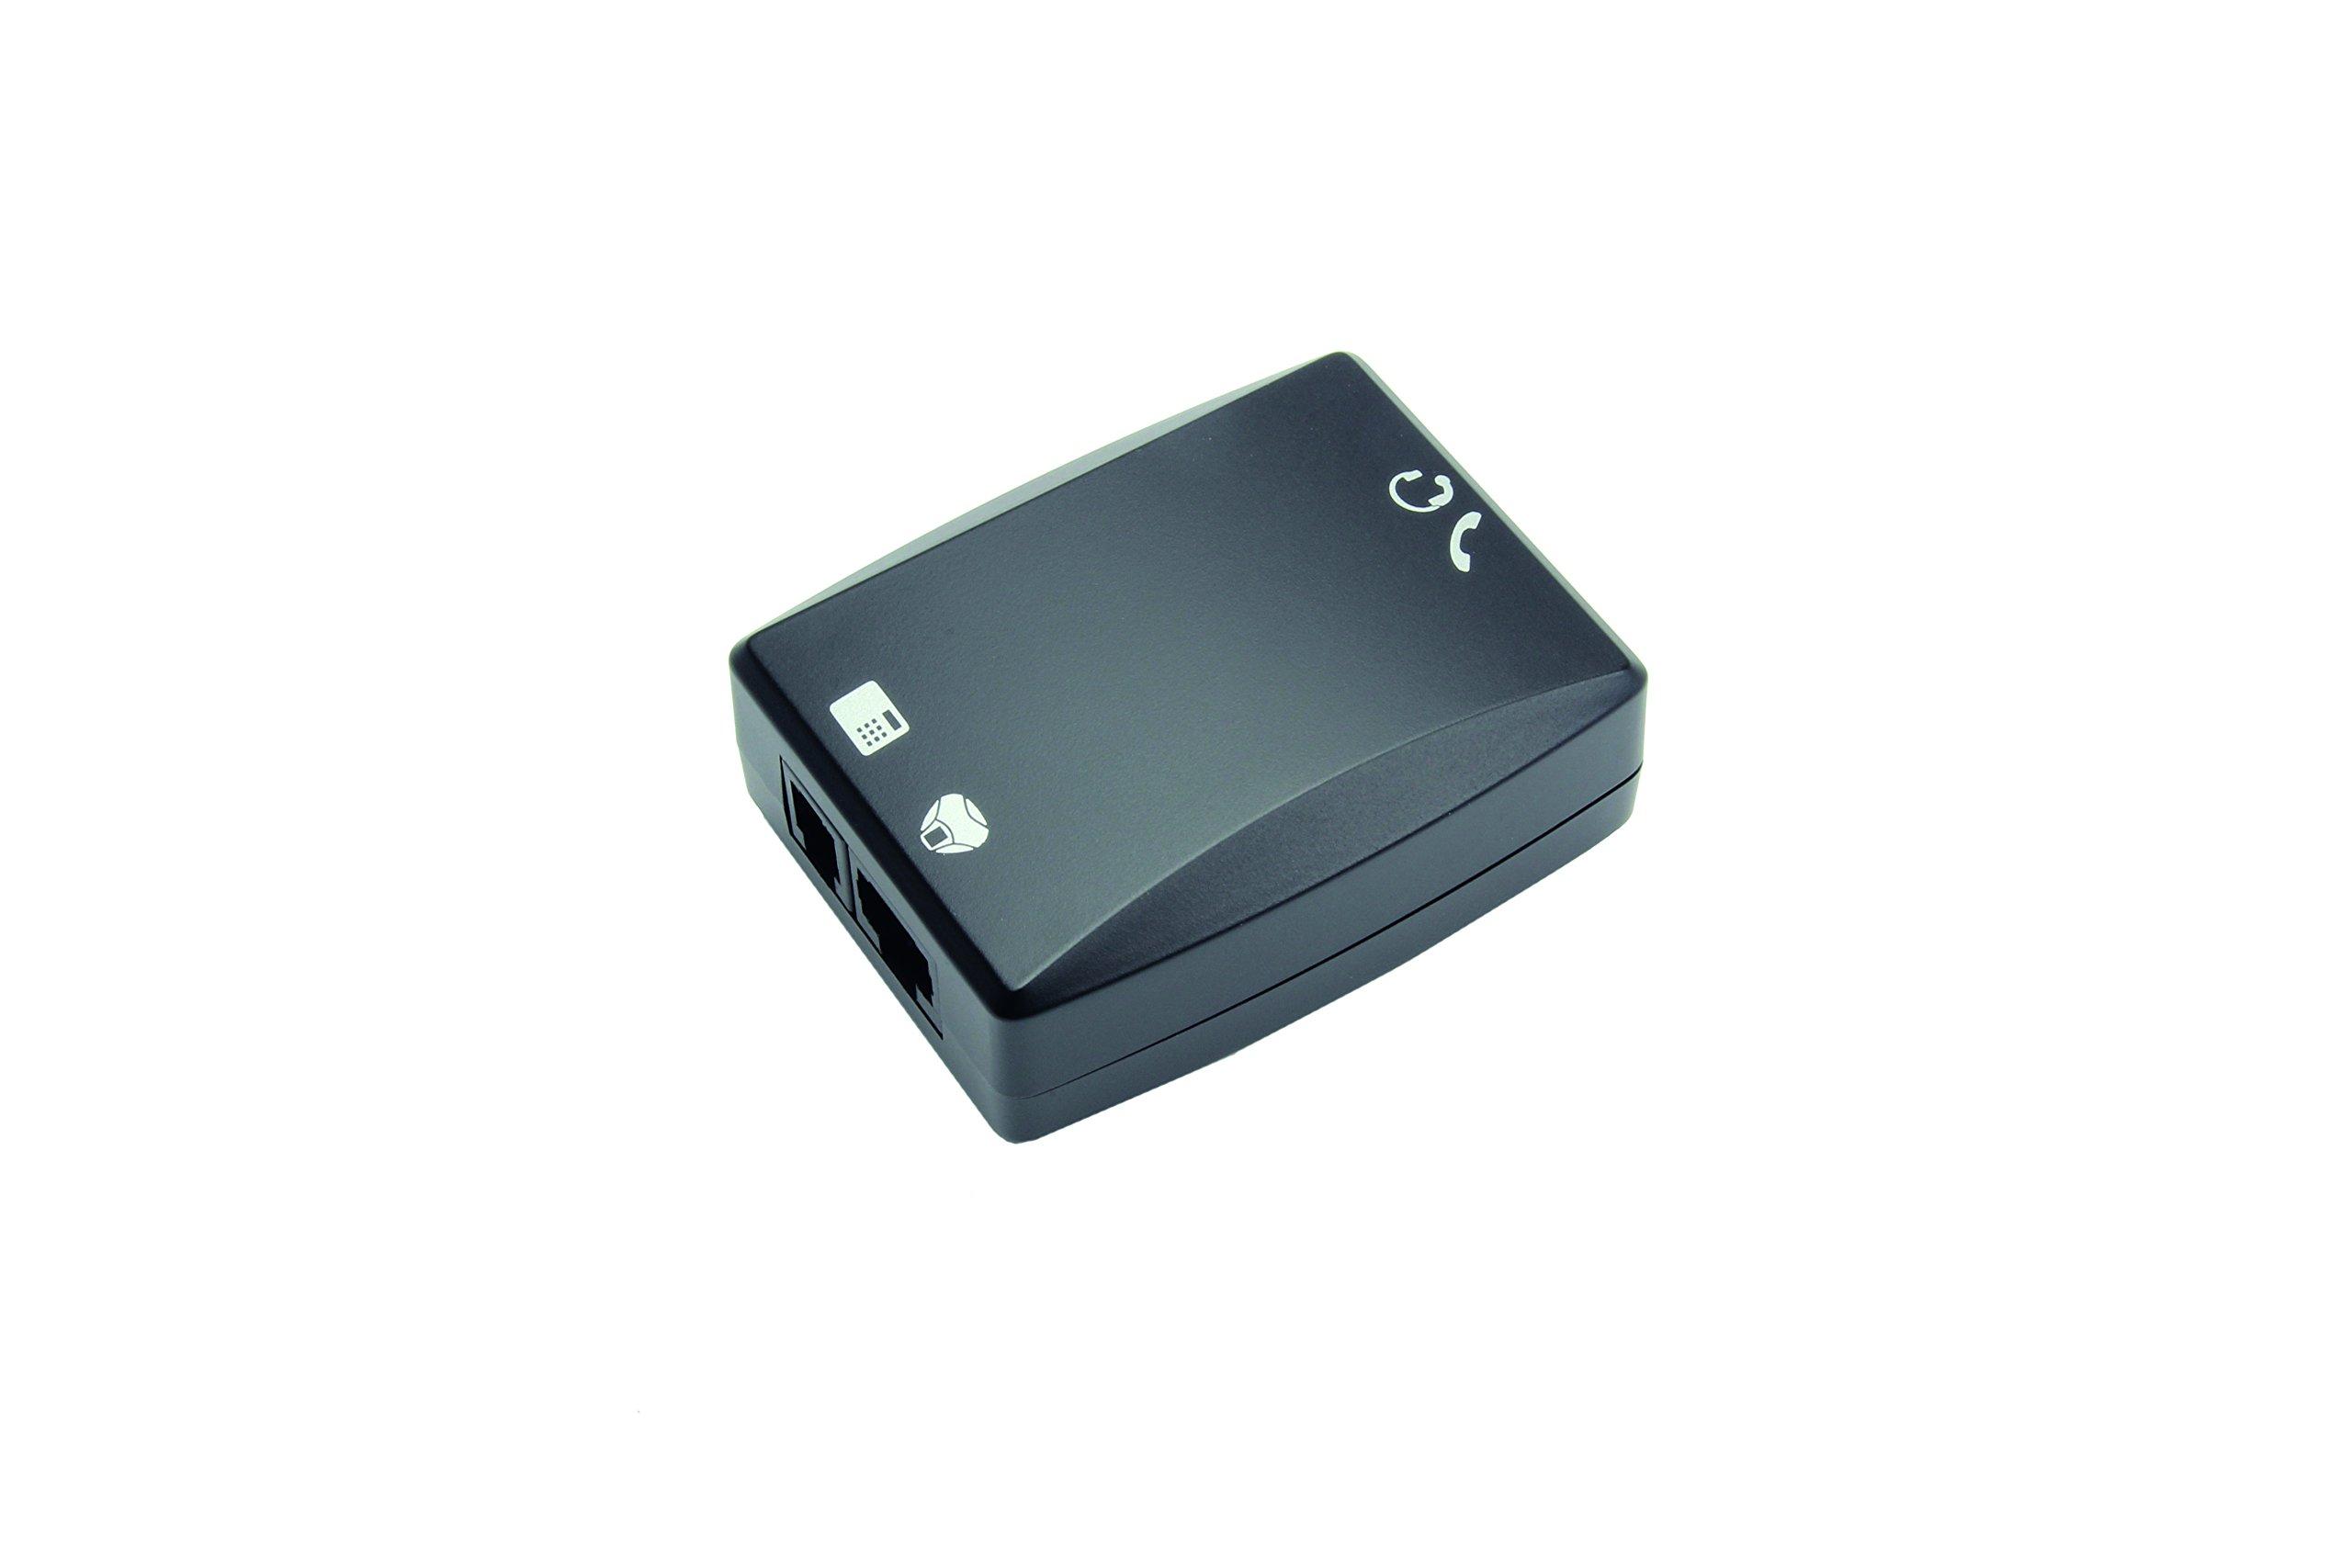 KONFTEL Deskphone Adapter / KO-900102126 /